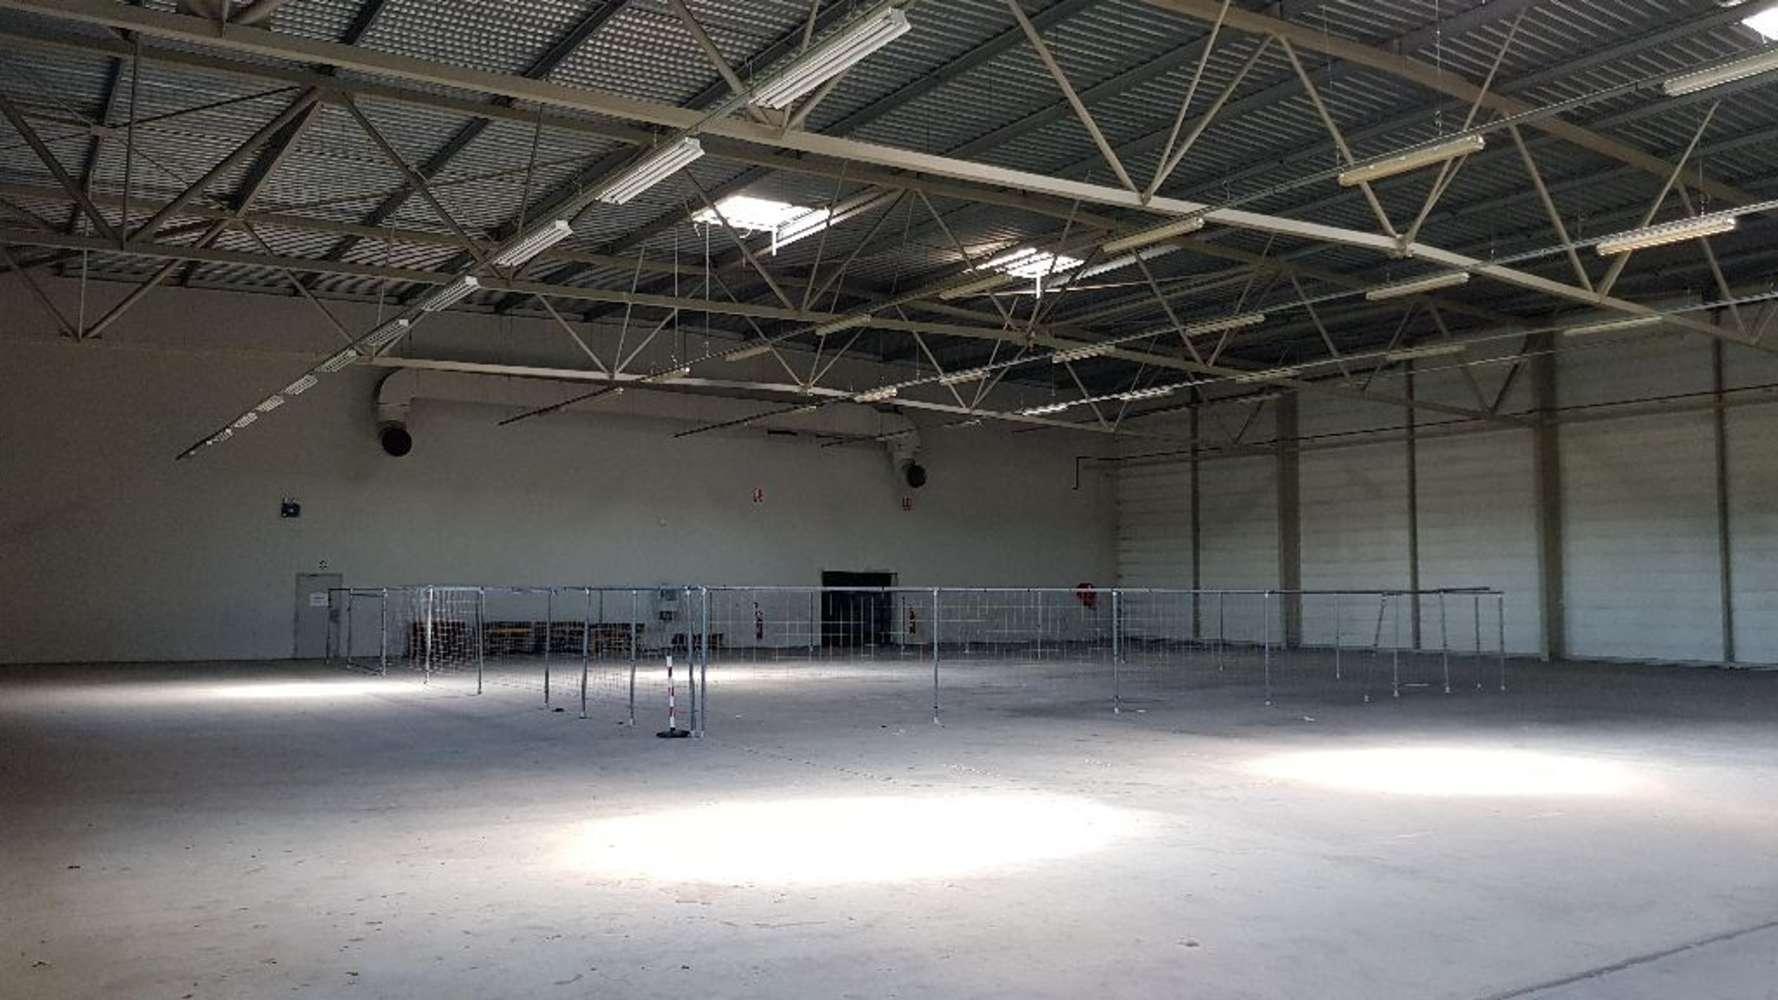 Activités/entrepôt Vaulx milieu, 38090 - Entrepot à vendre Lyon - Vaulx Milieu - 9873749